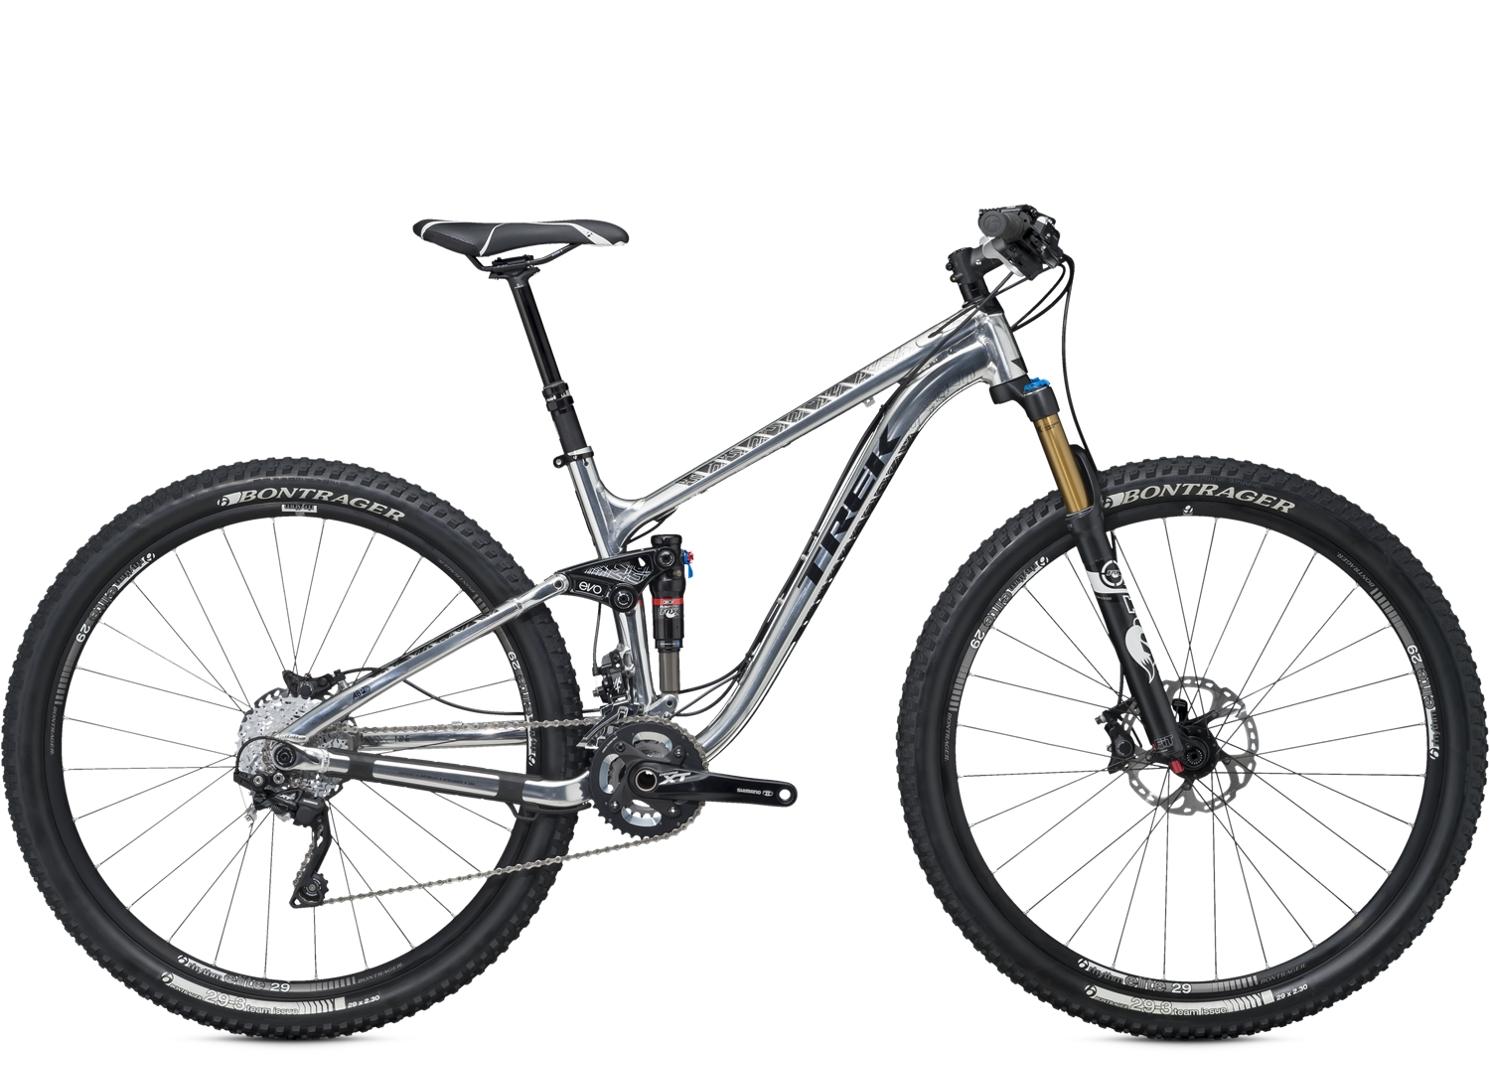 Trek Fuel EX 9 29 | $4299rrp | World's Best Trail Bike